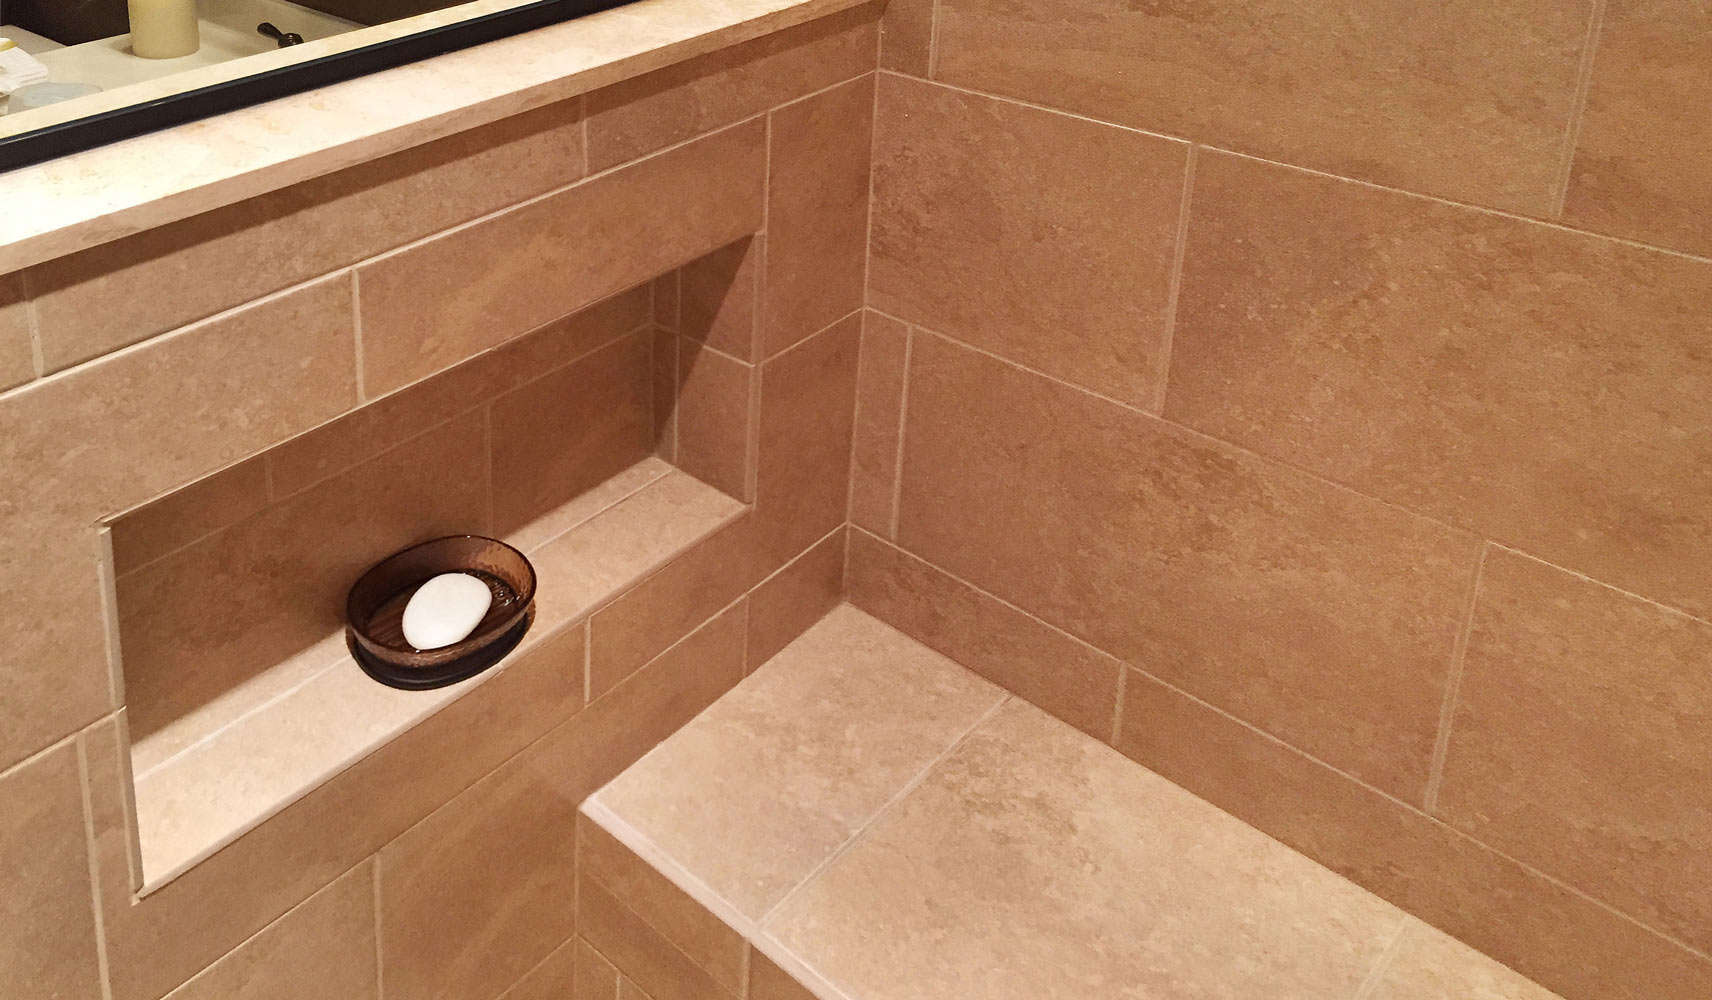 lakeshore-bathroom-tile-detail